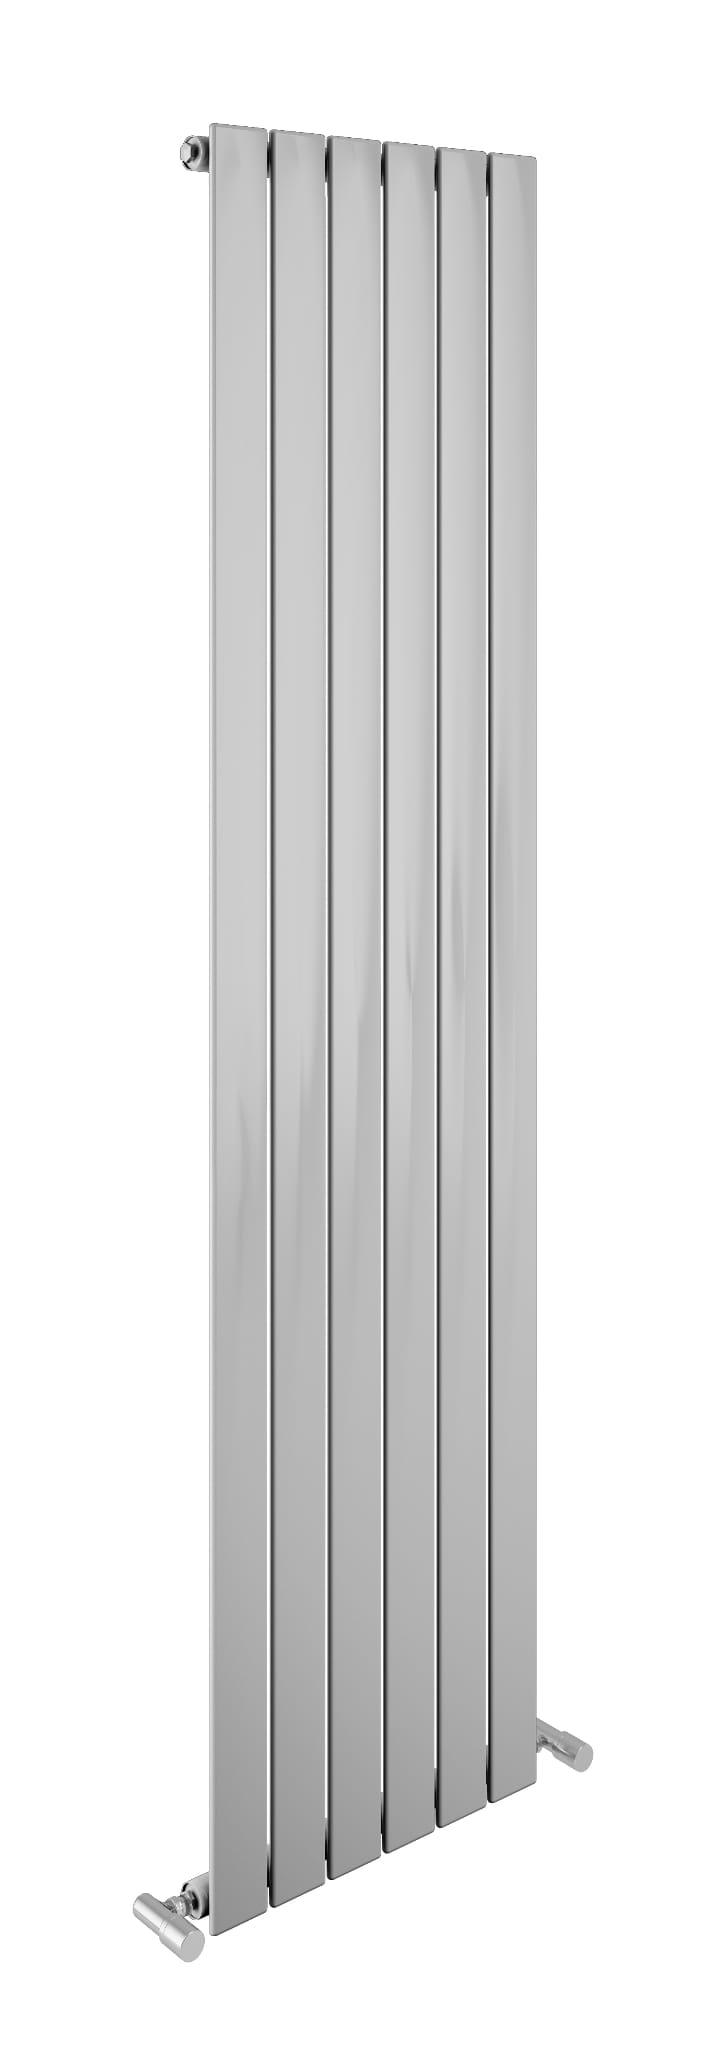 Sanotechnik - EISENSTADT - Dekoratívny kúpeľňový radiátor chróm 532 W 459 x 1800 mm